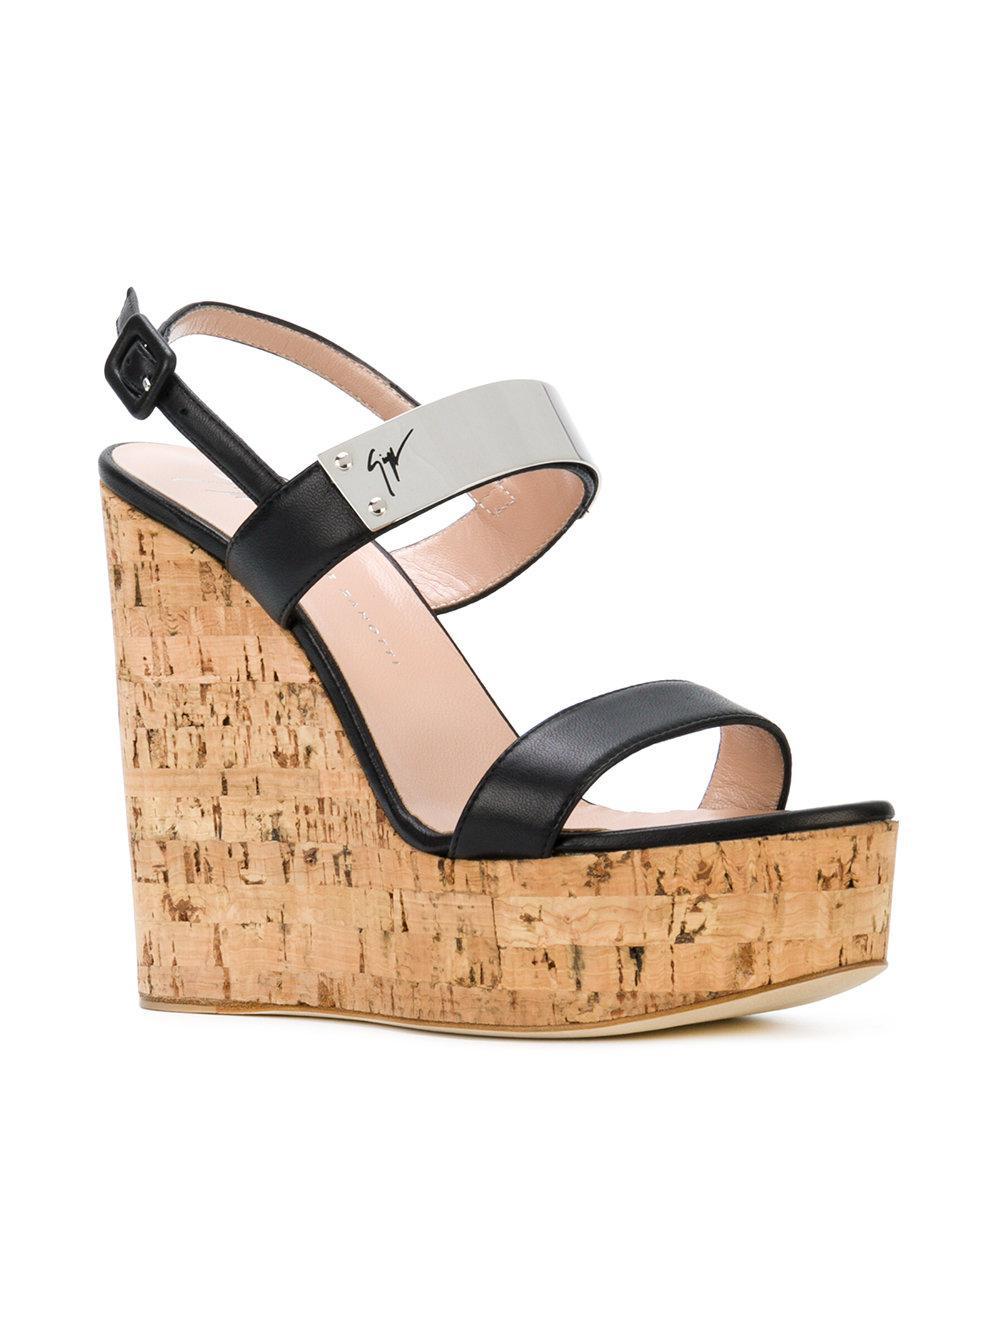 51f752e8f Lyst - Giuseppe Zanotti Cork Wedge Sandals in Black - Save 75%